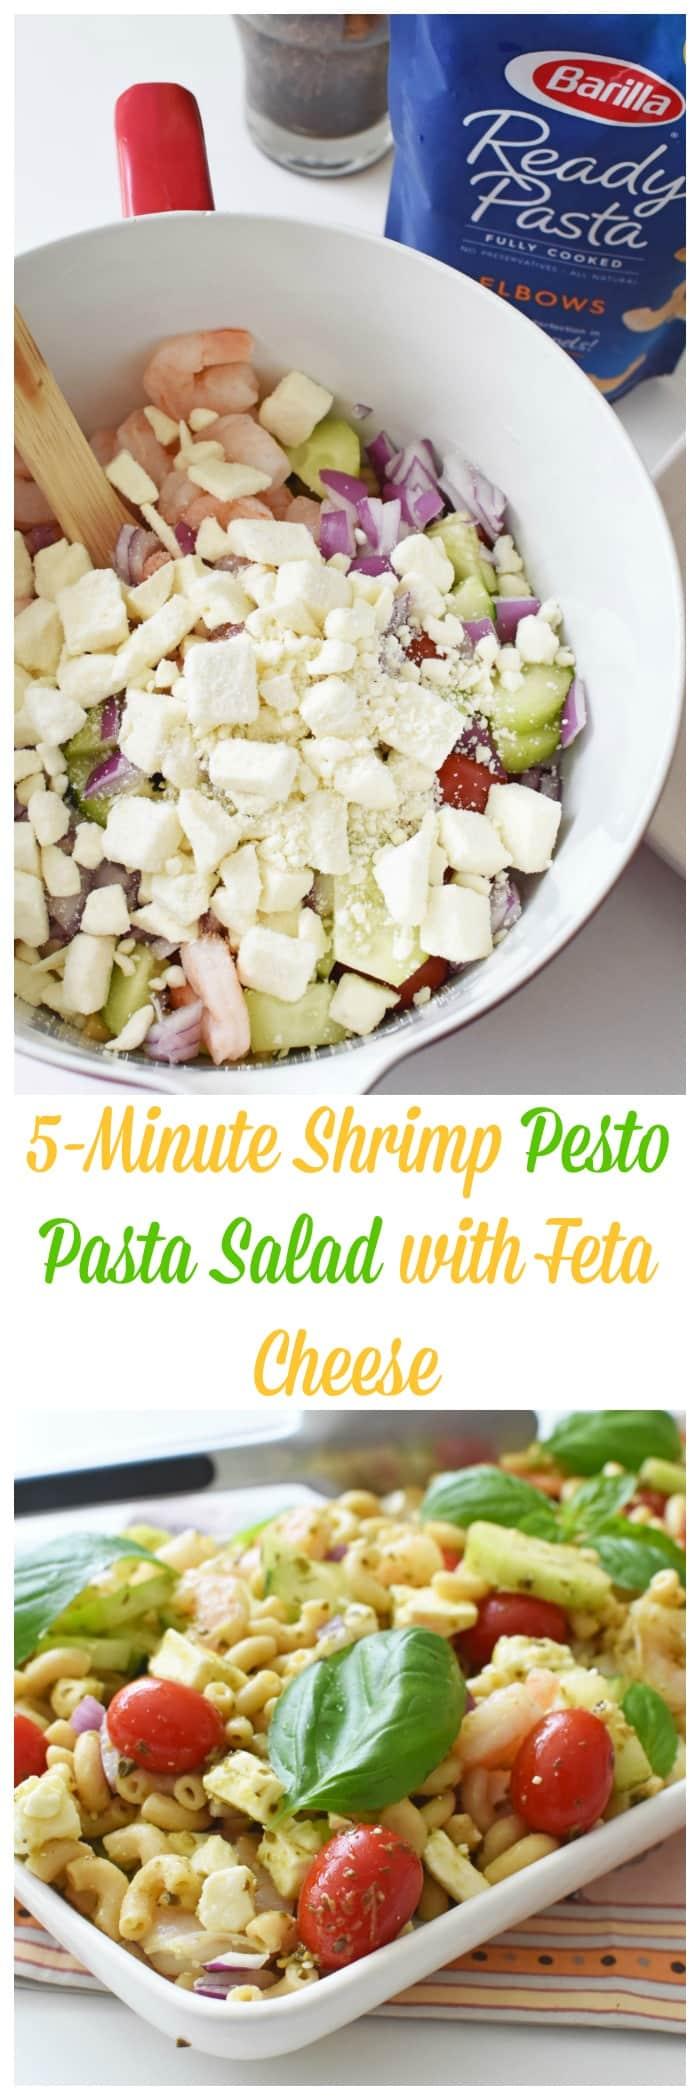 Shrimp Pesto Pasta Salad with Feta Cheese